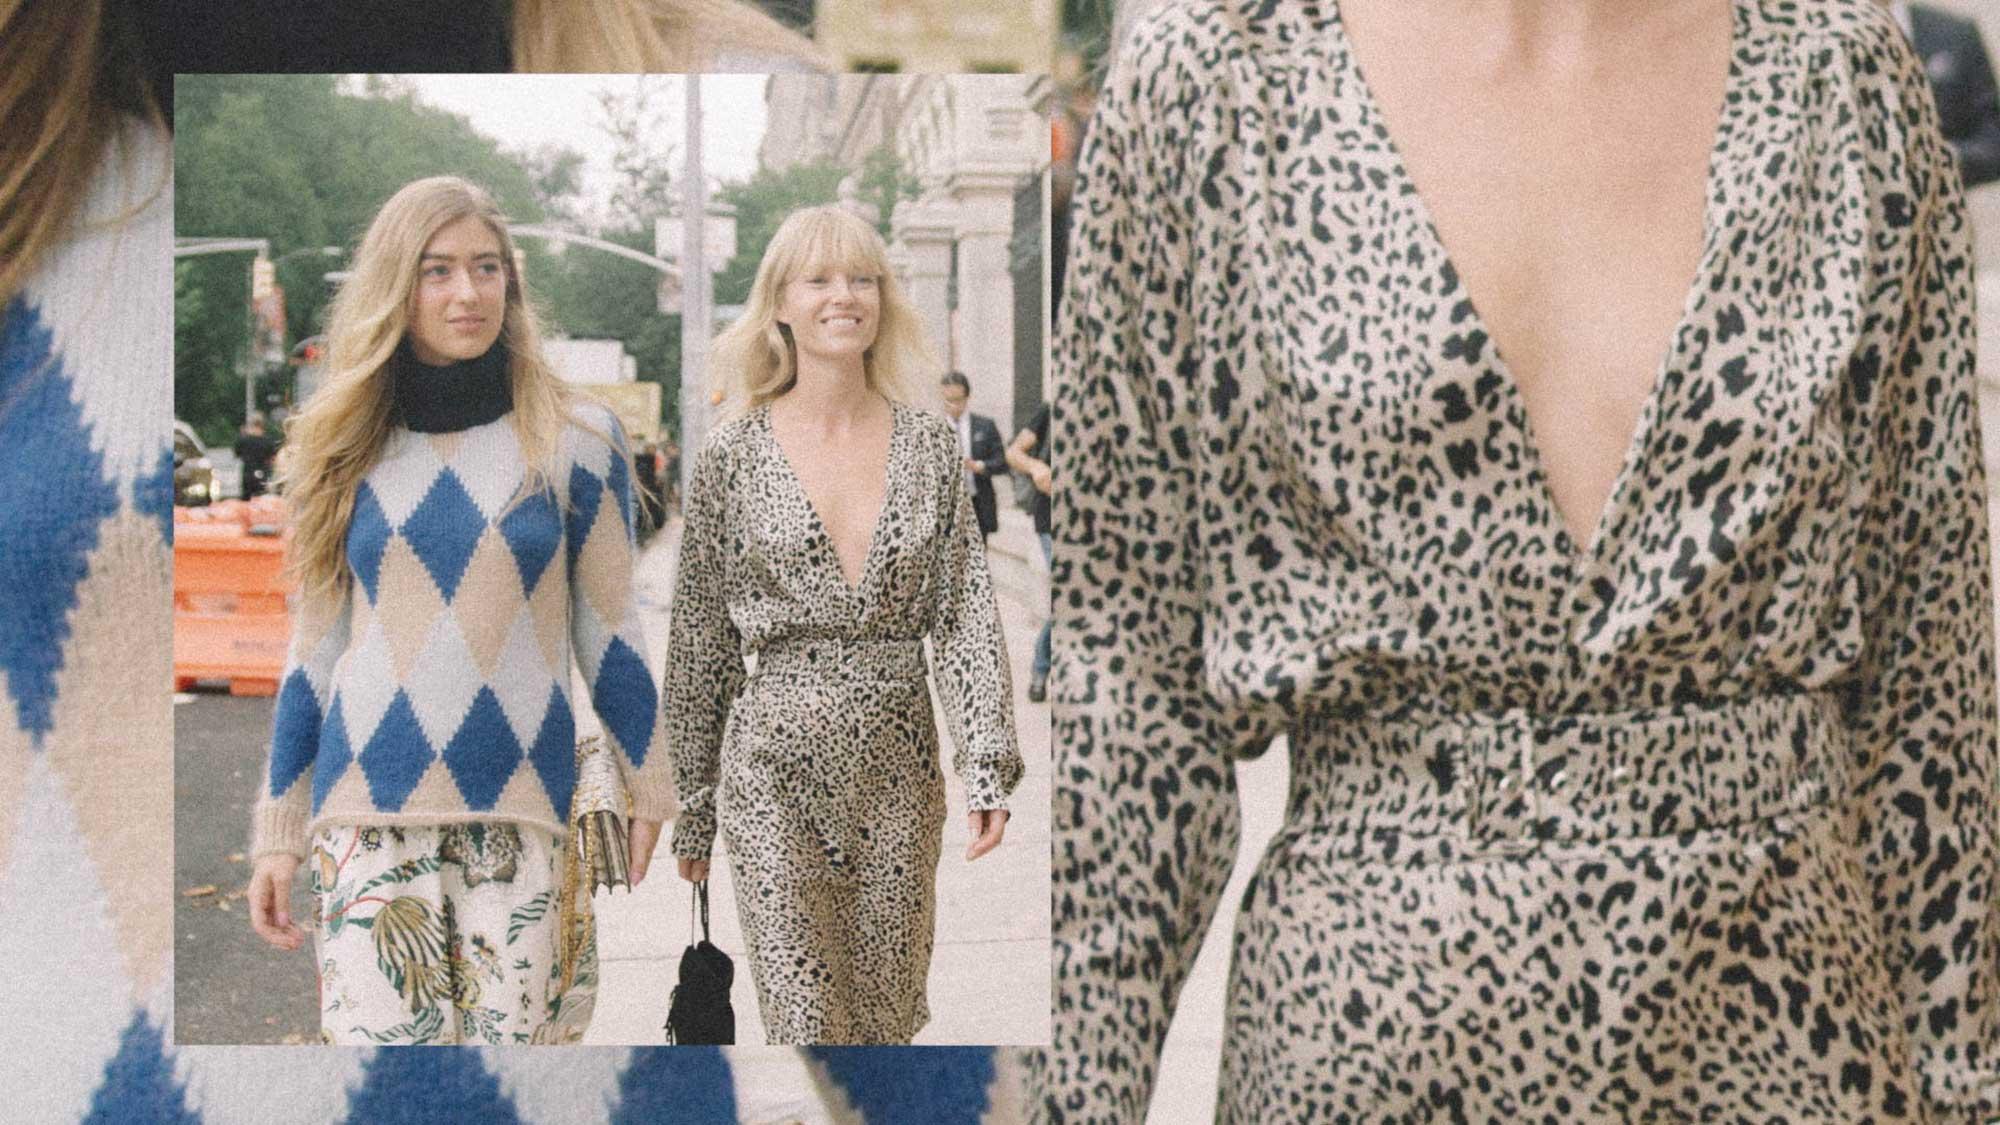 10 Easy Ways to Pull Off Leopard Print, silk leopard dress street style.jpg